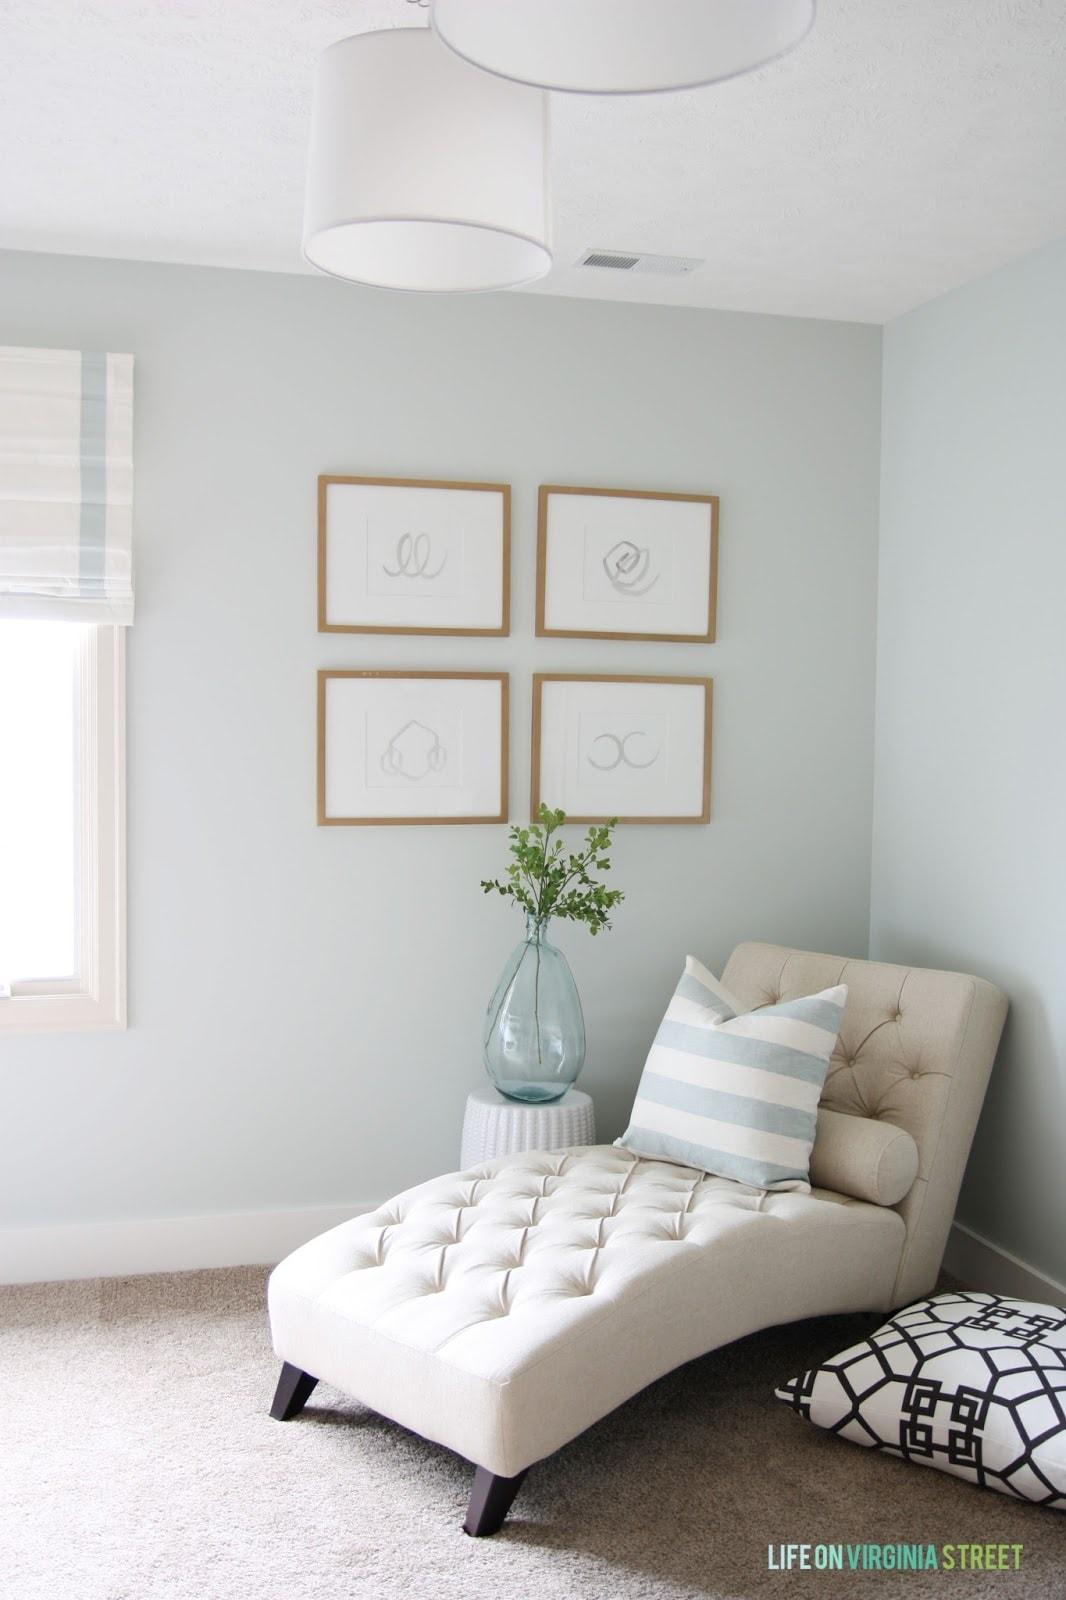 Coastal craft room with Benjamin Moore Healing Aloe walls. I'm loving the soft bluish-green pale walls!